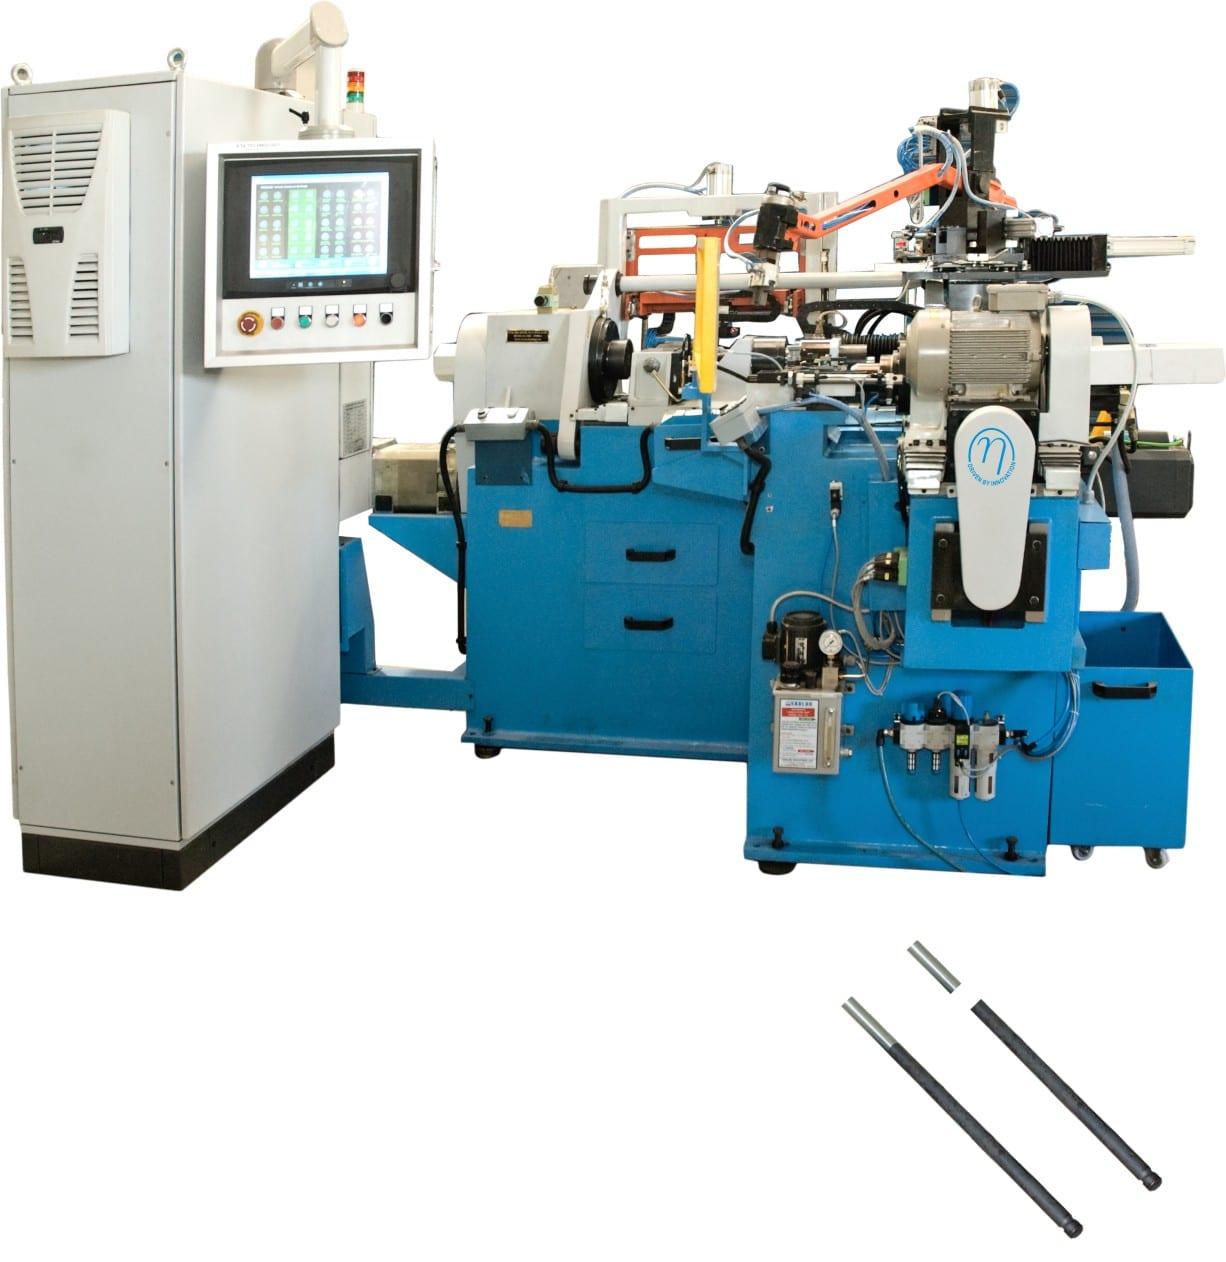 3Tonne Friction Welding machine Pin to Pin